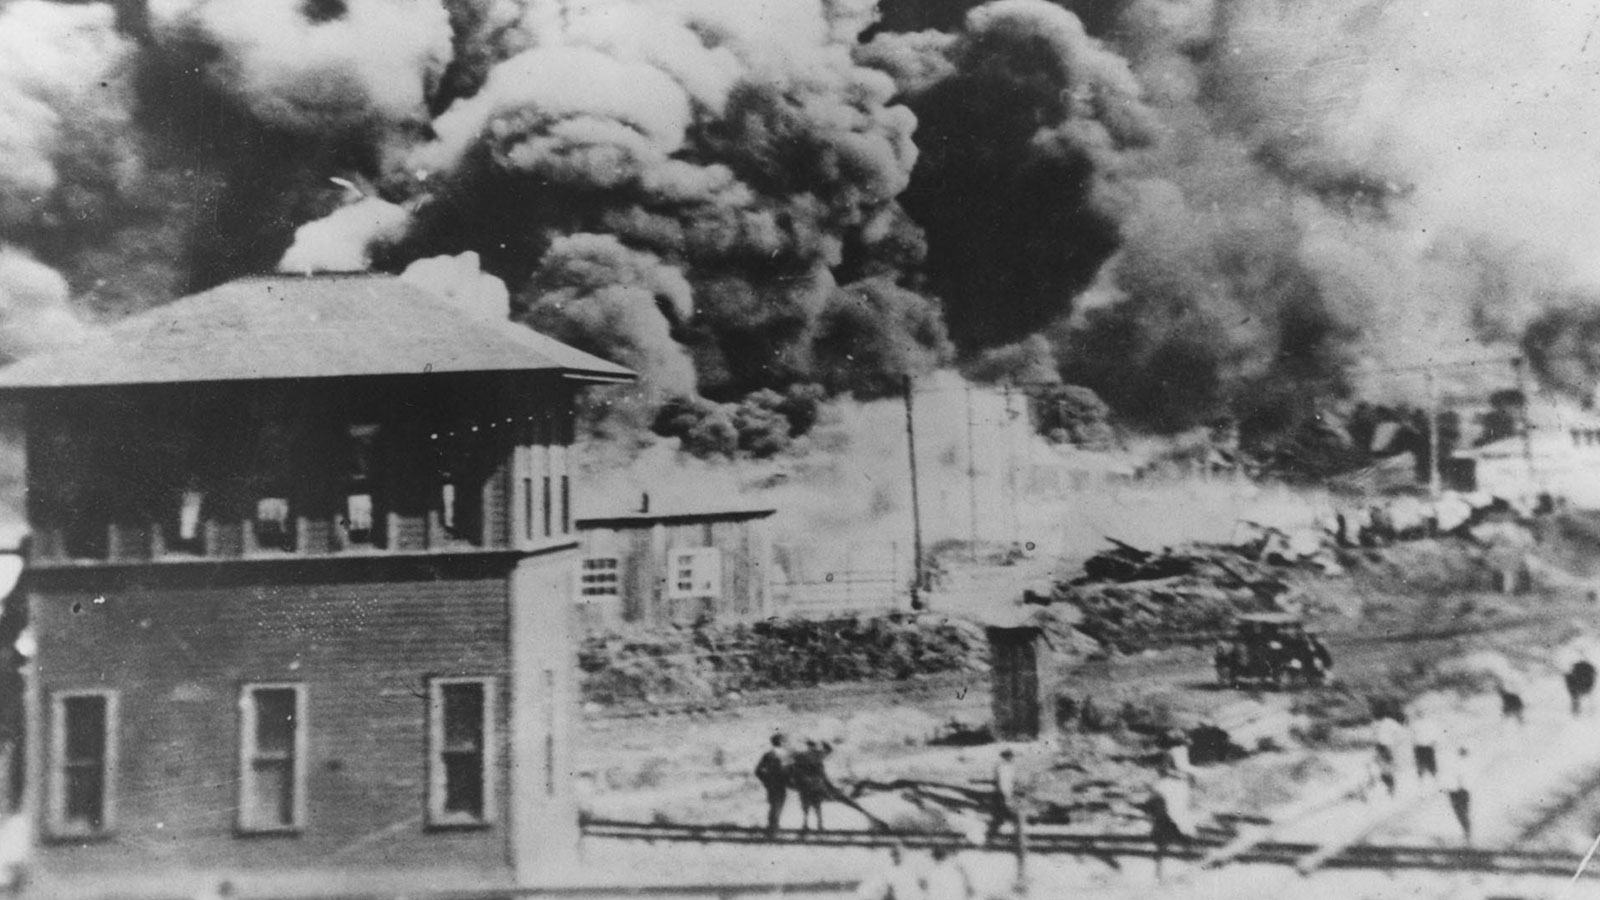 Smoke rises north of Greenwood Avenue from Hartford Avenue, in Tulsa, Okla. on June 1, 1921.